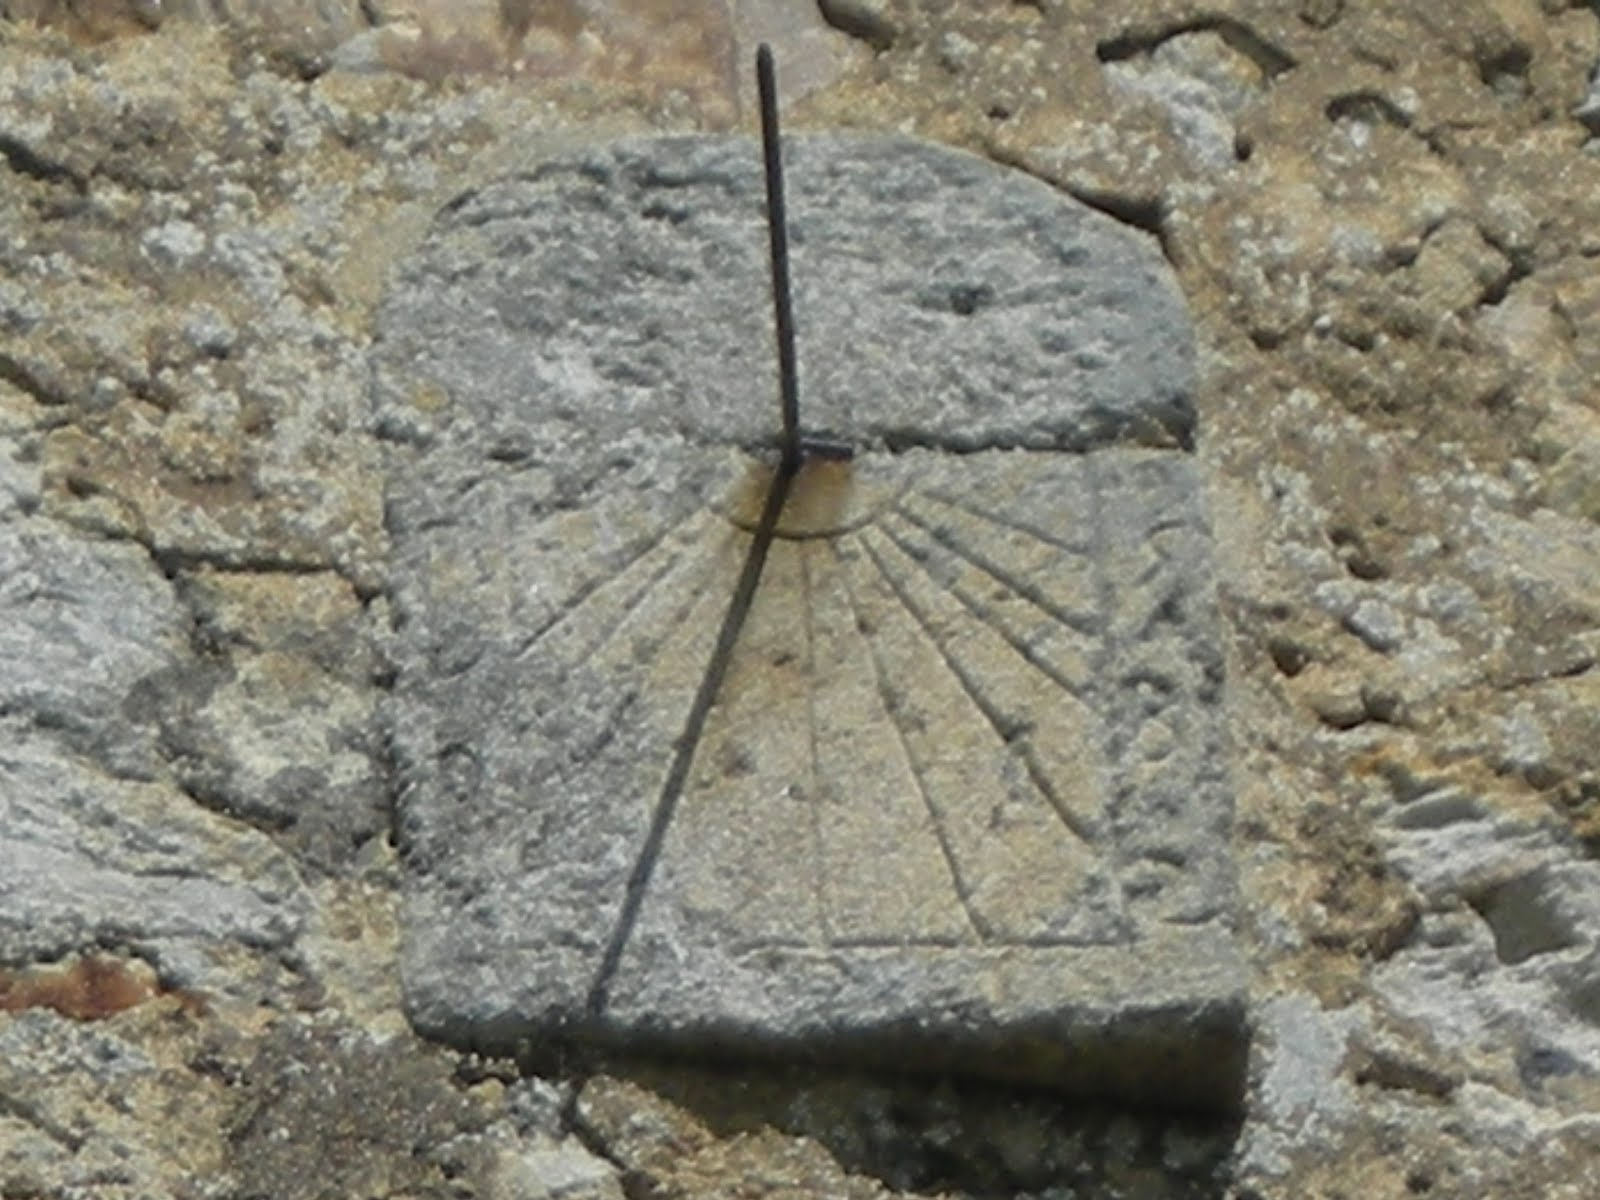 Reloj de Sol.Eugenia Grandet, Honoré de Balzac. Descripciones